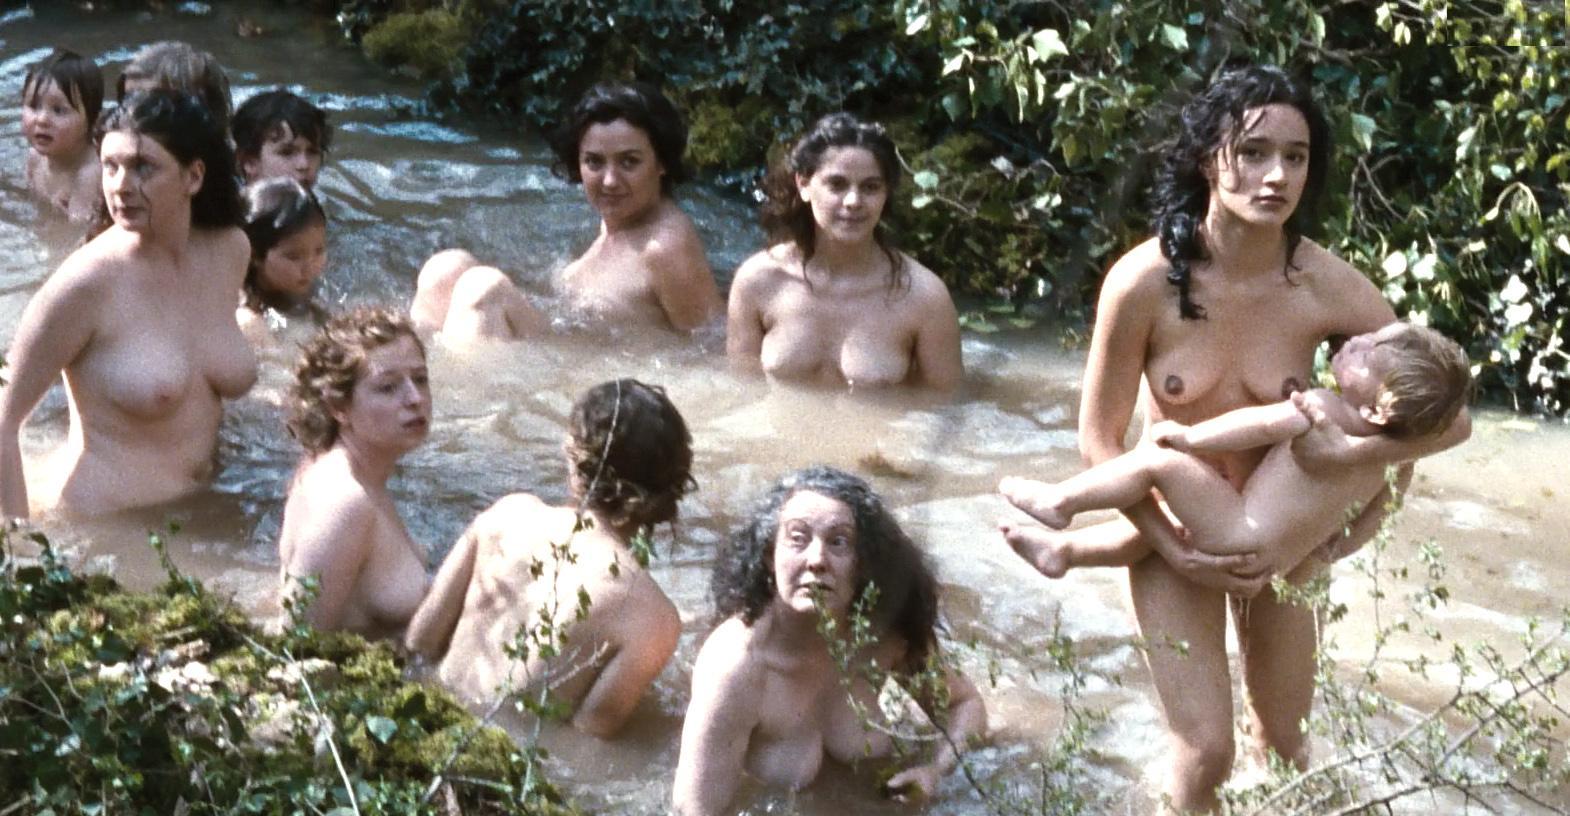 Long Legged Nude Women